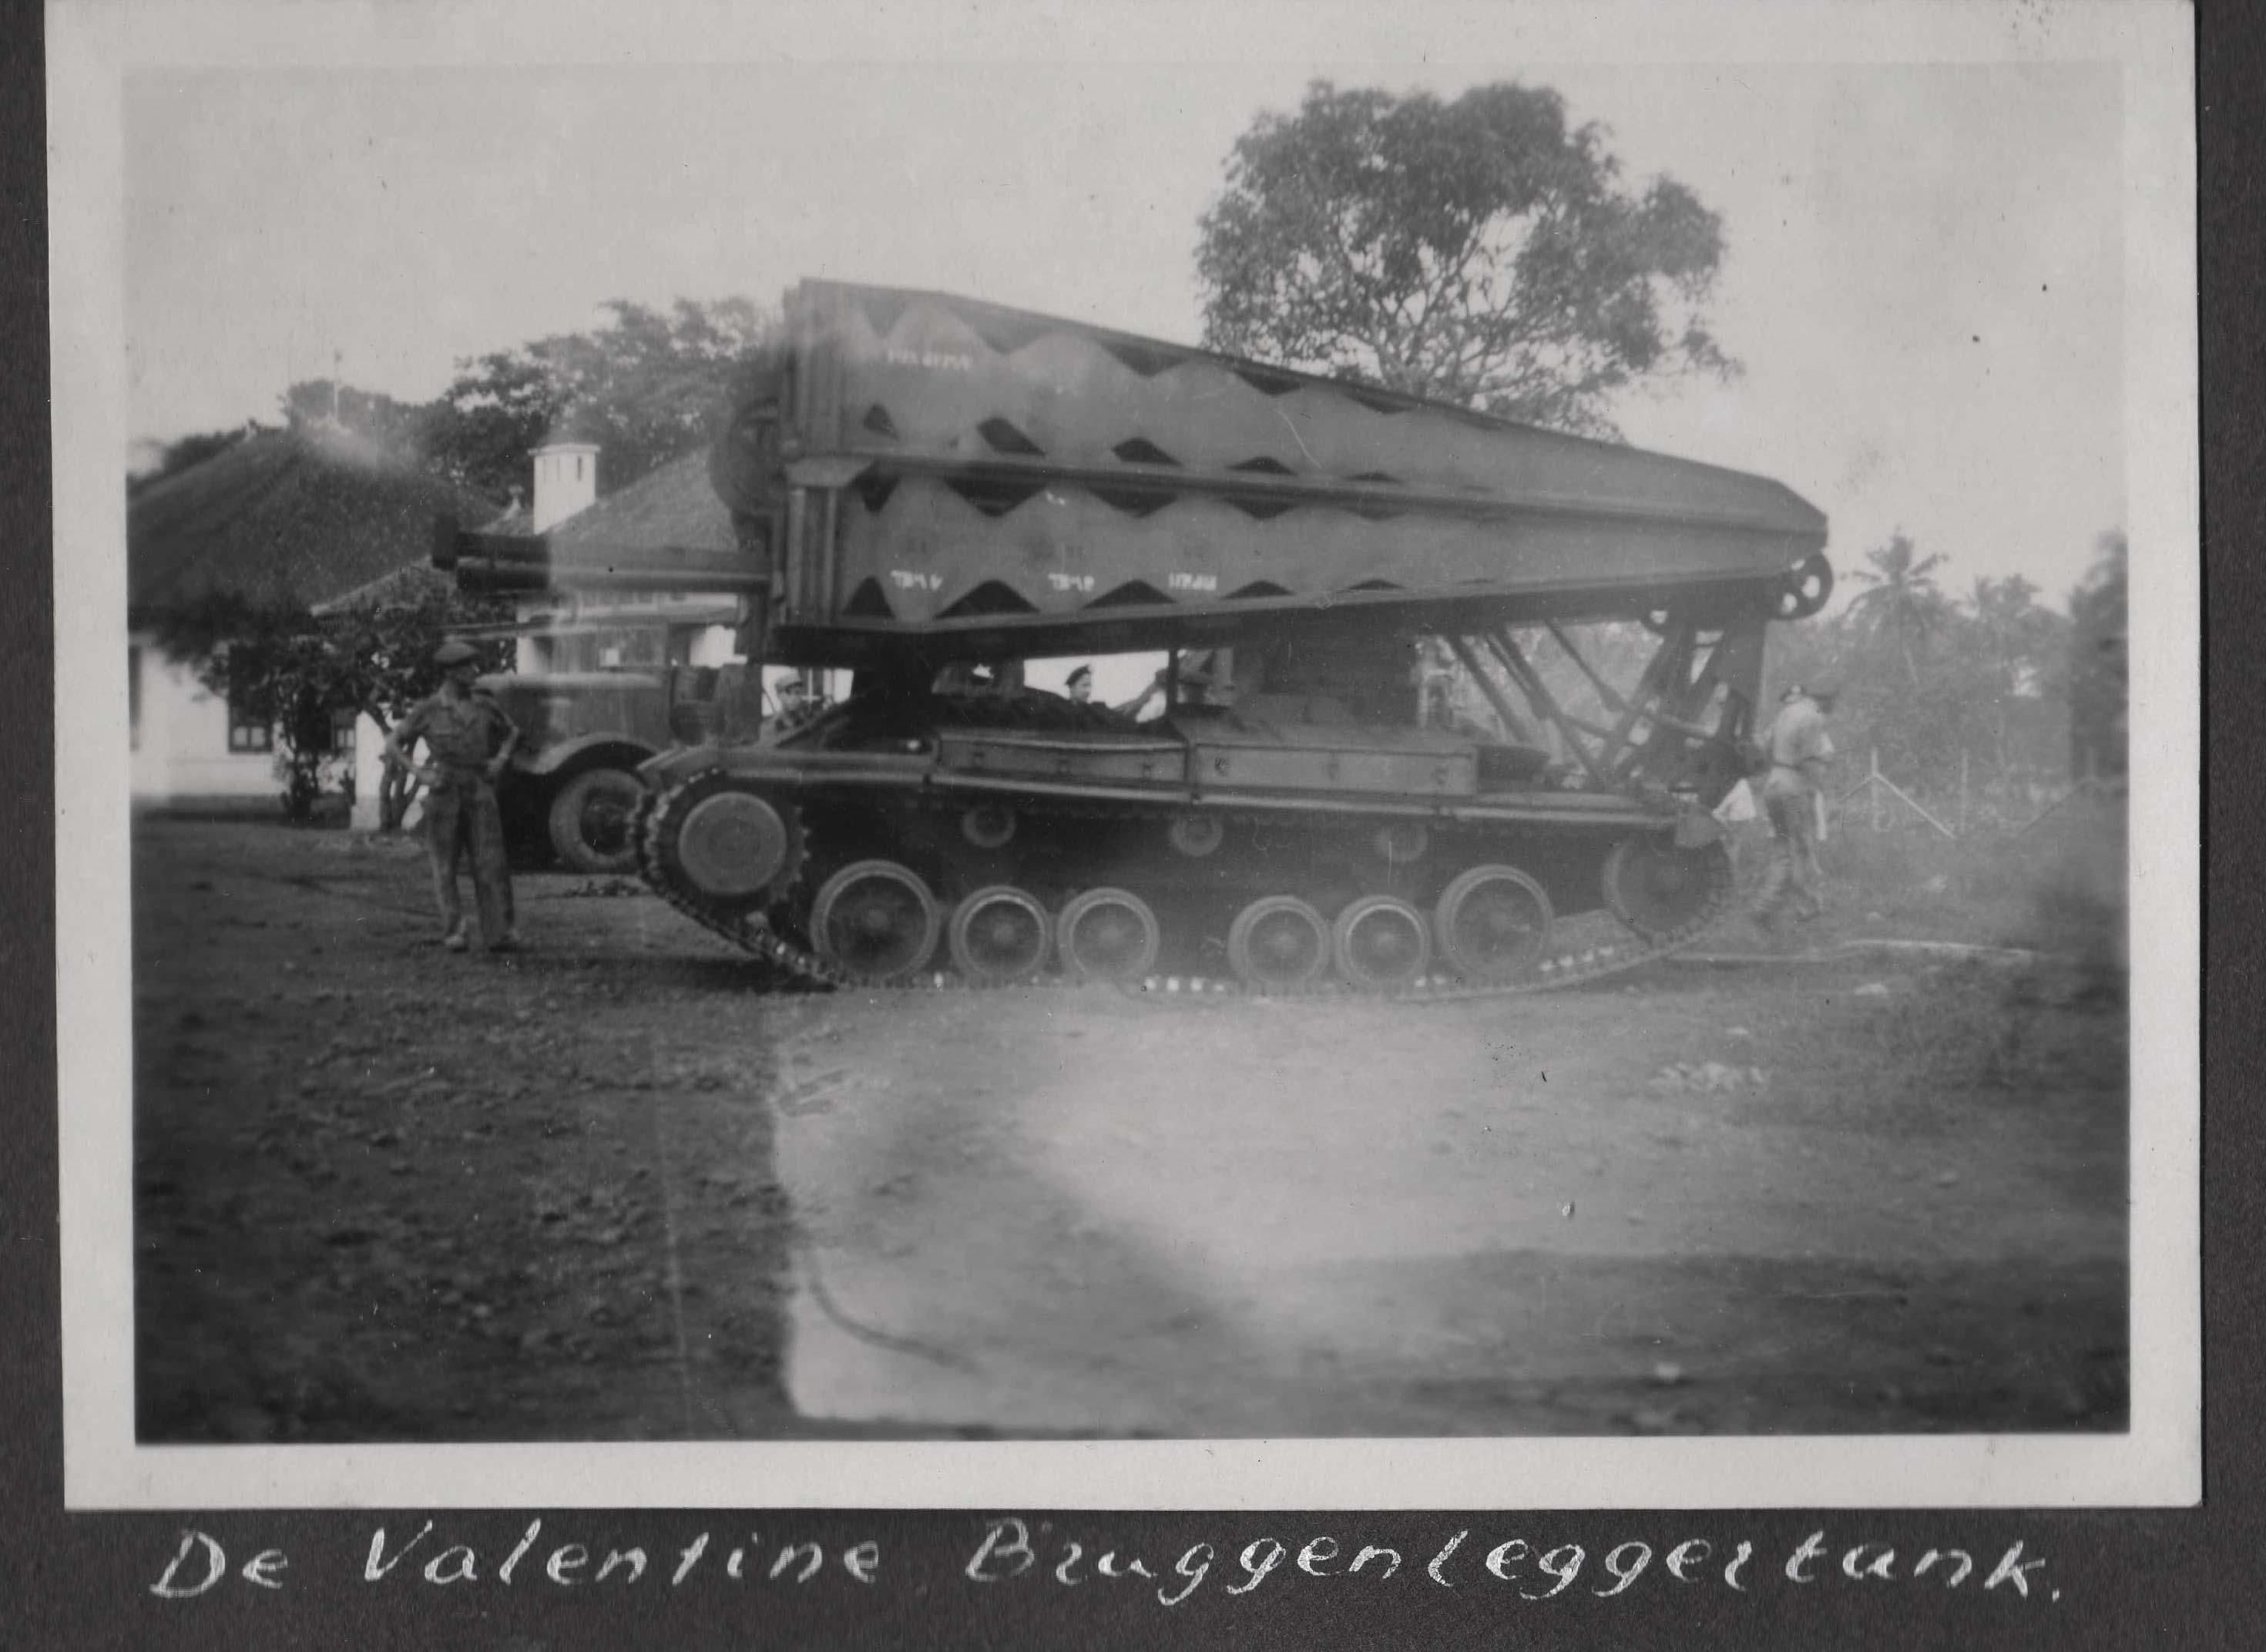 valantine-bruggenlegger-tank-in-actie.jpg